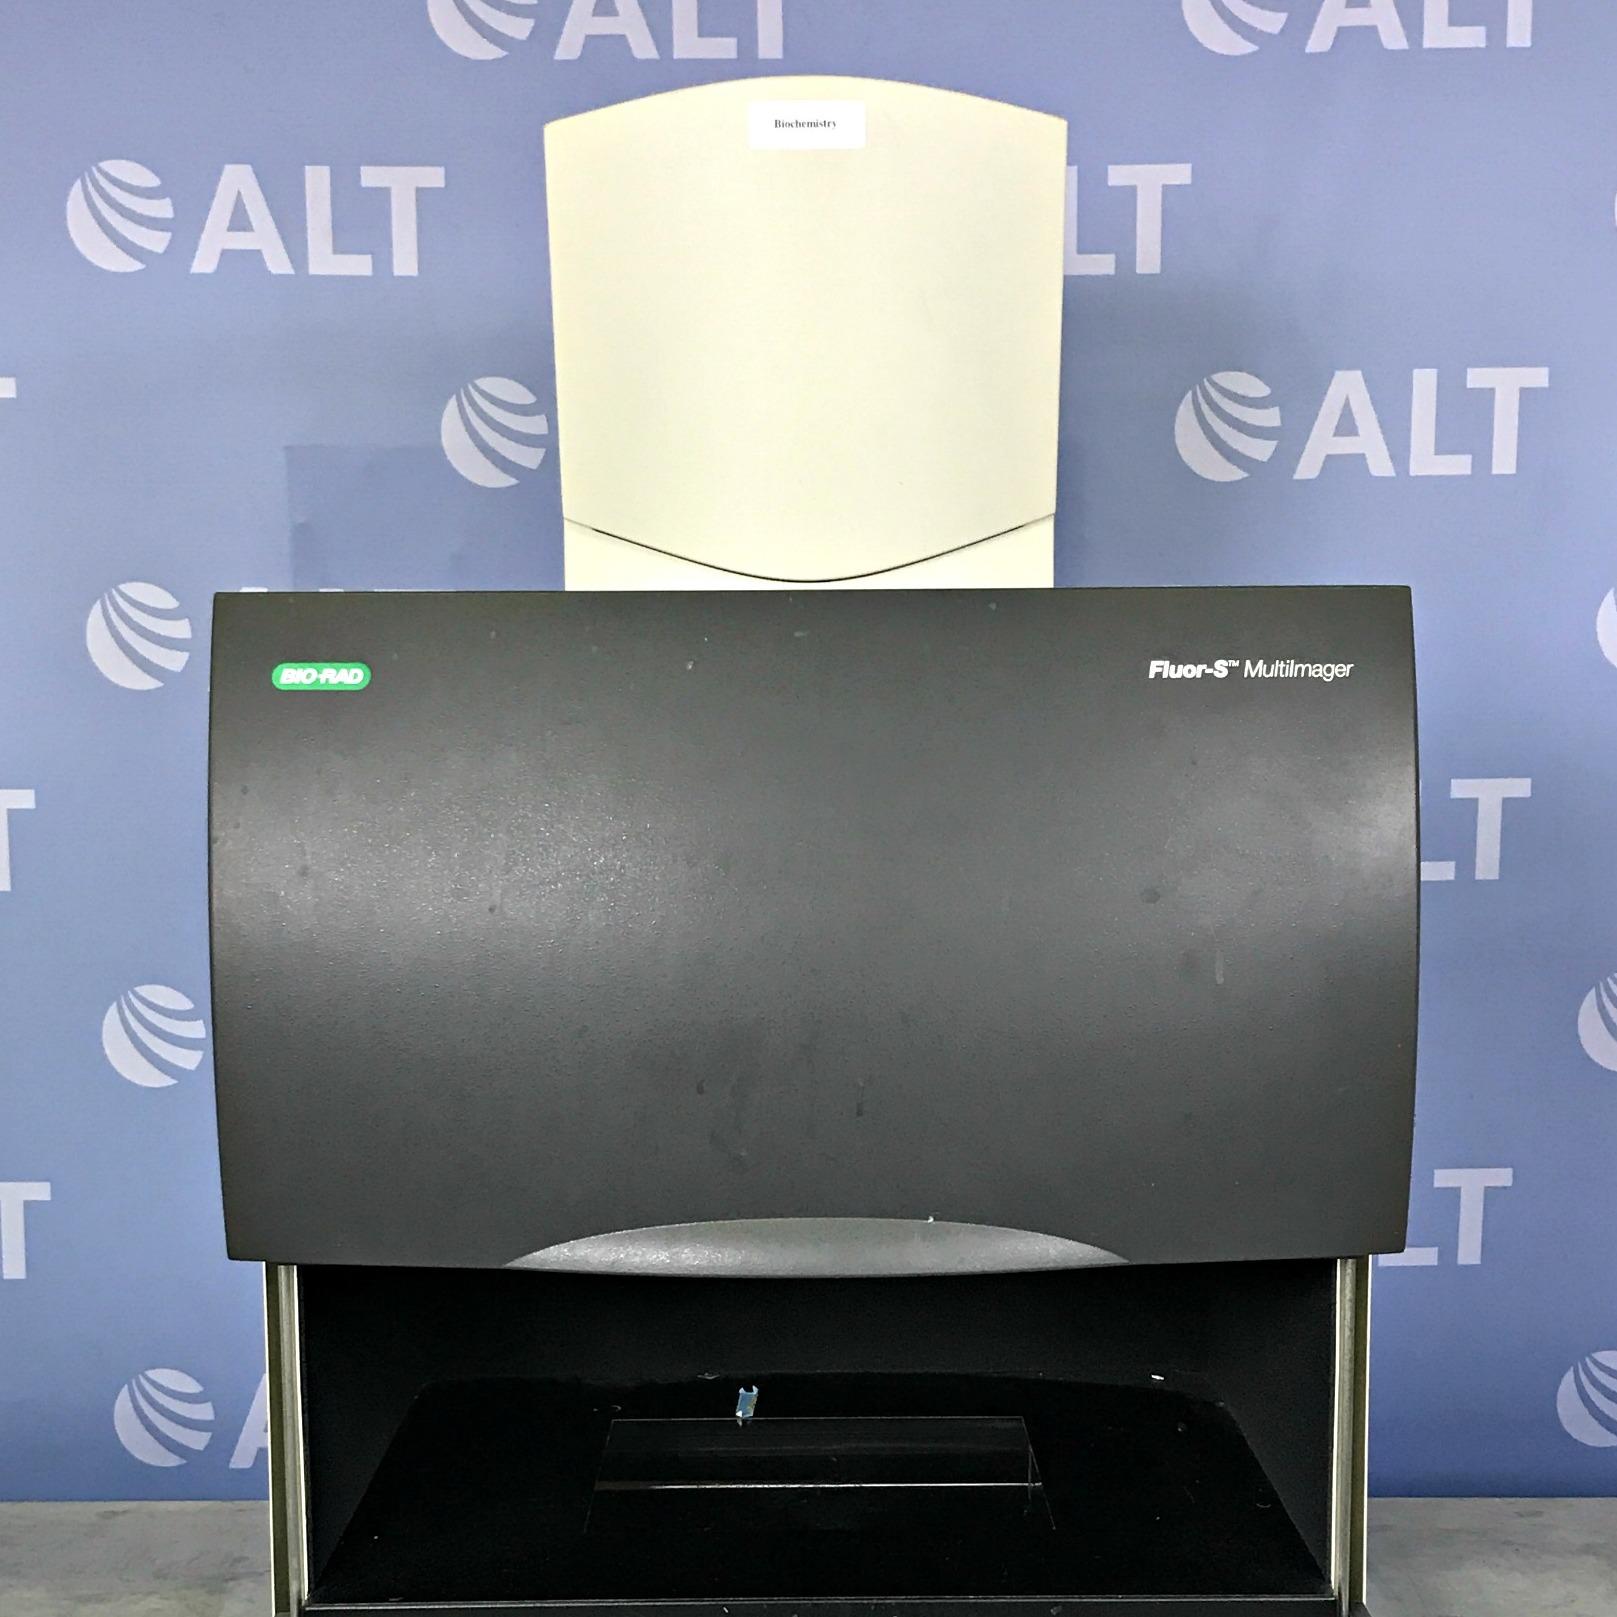 Bio-Rad Fluor-S MultiImager Image